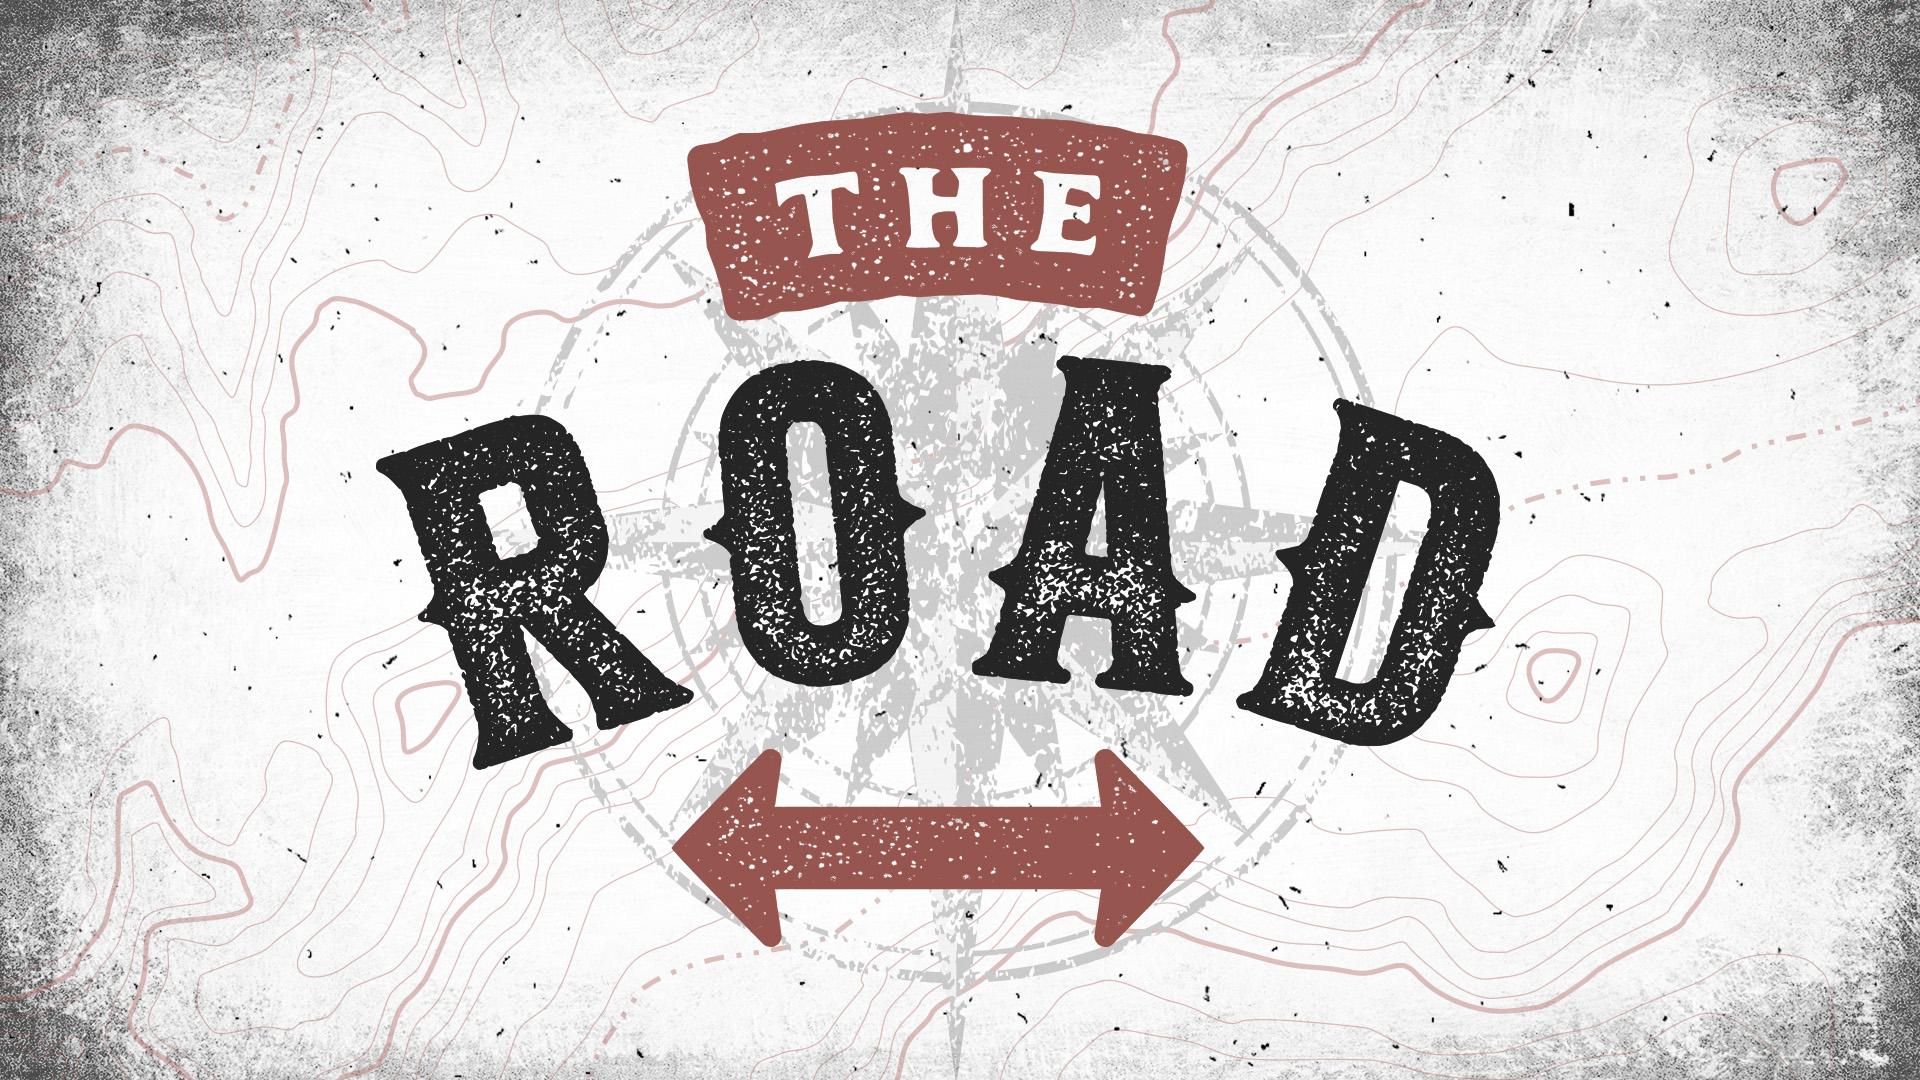 Southeast Christian Church: The Road | Shane Harris - Melbourne Florida Graphic Design